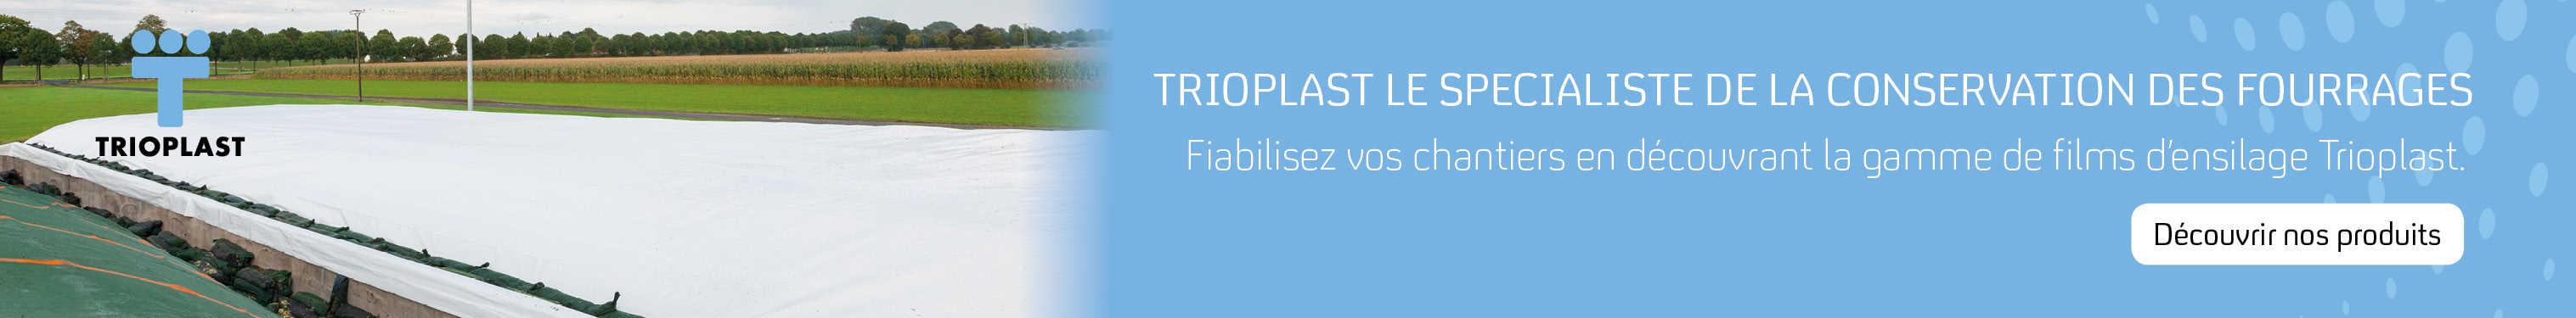 TRIOPLAST 2018/09 Top gauche